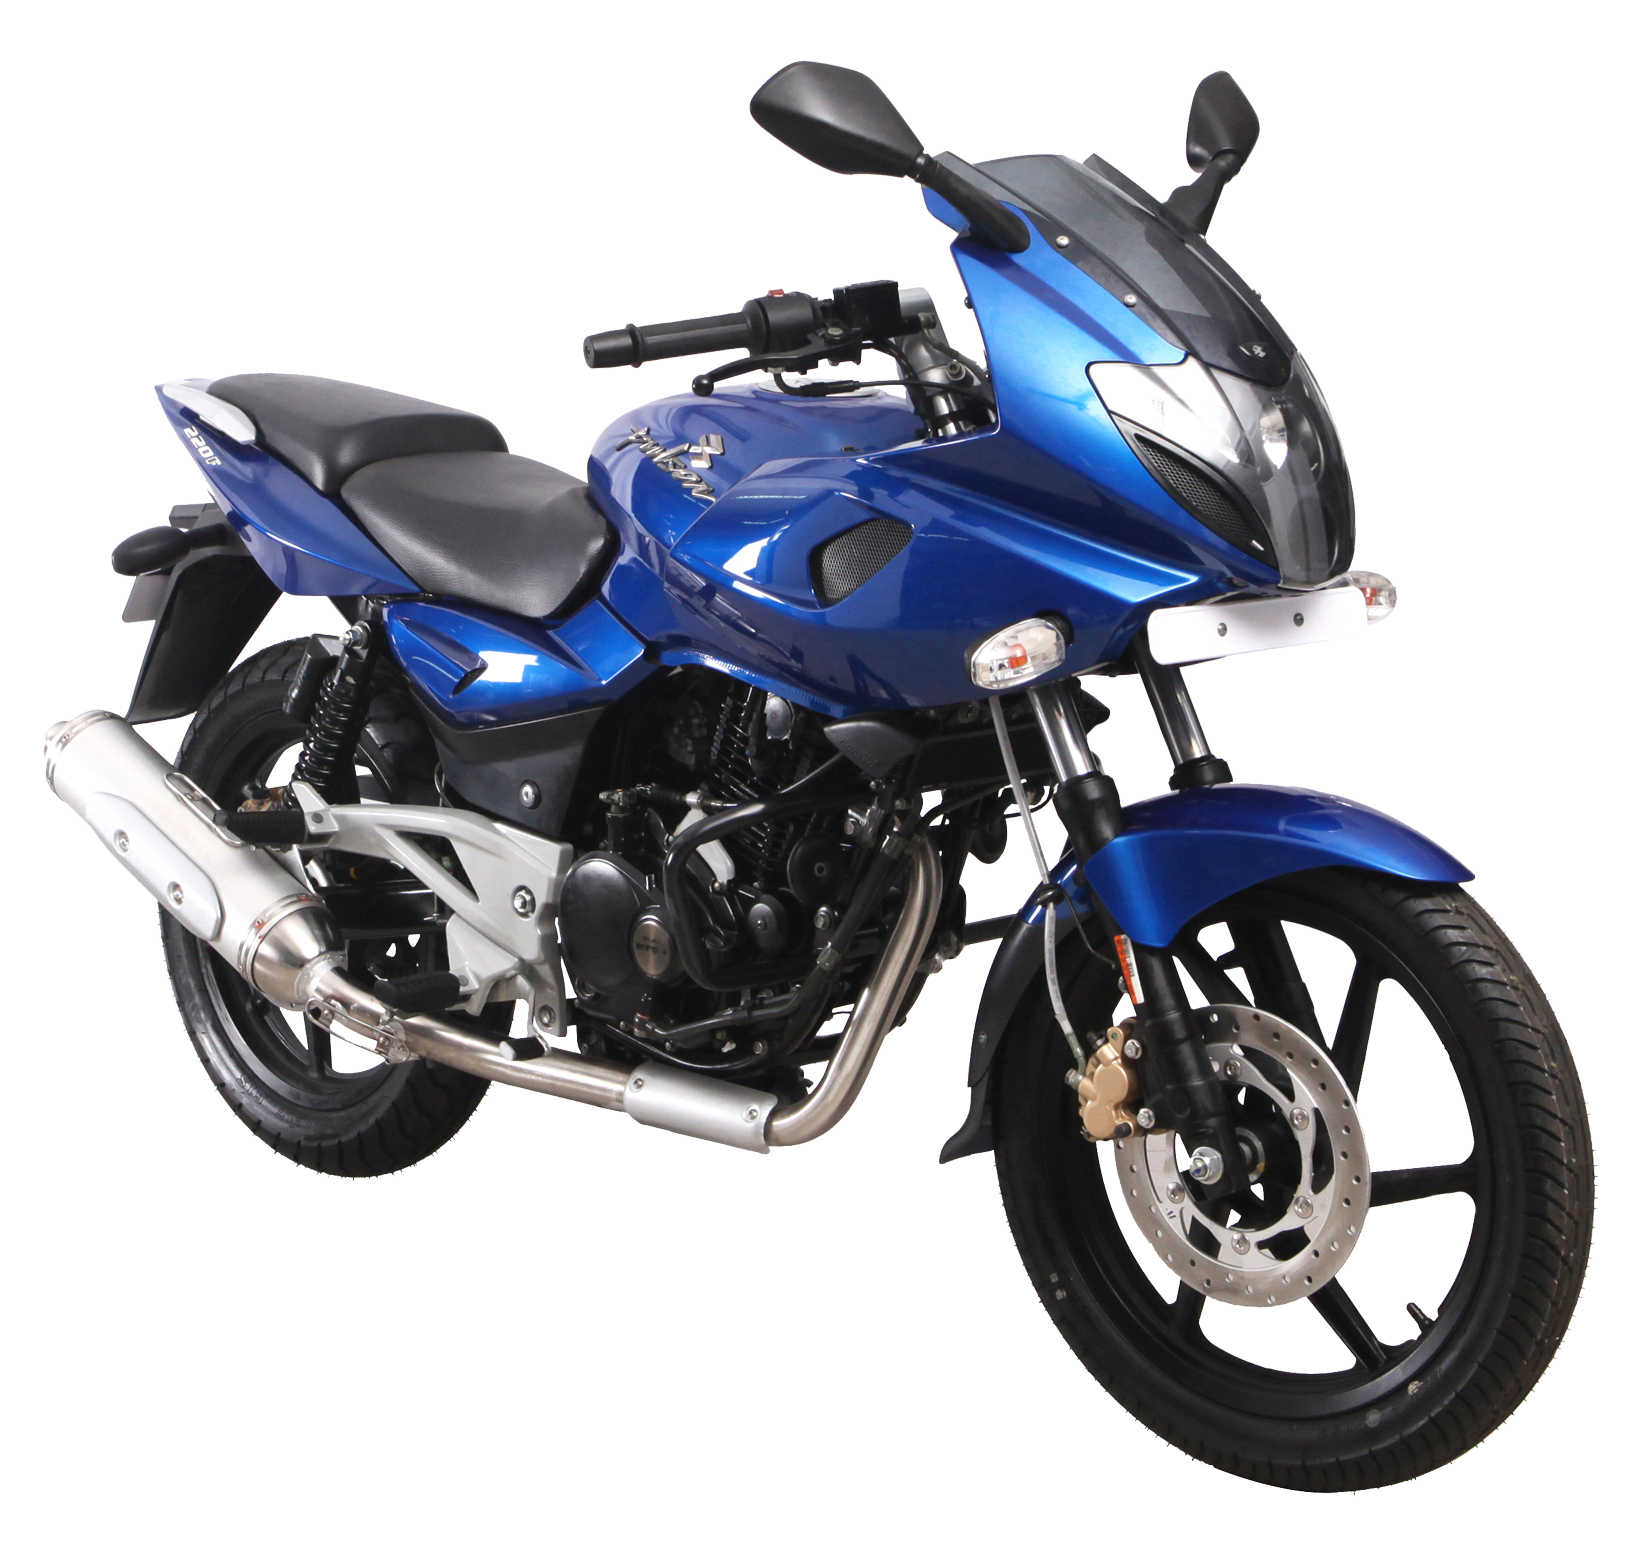 Blue Bajaj Pulsar 220F Motorcycle Bike PNG Image.